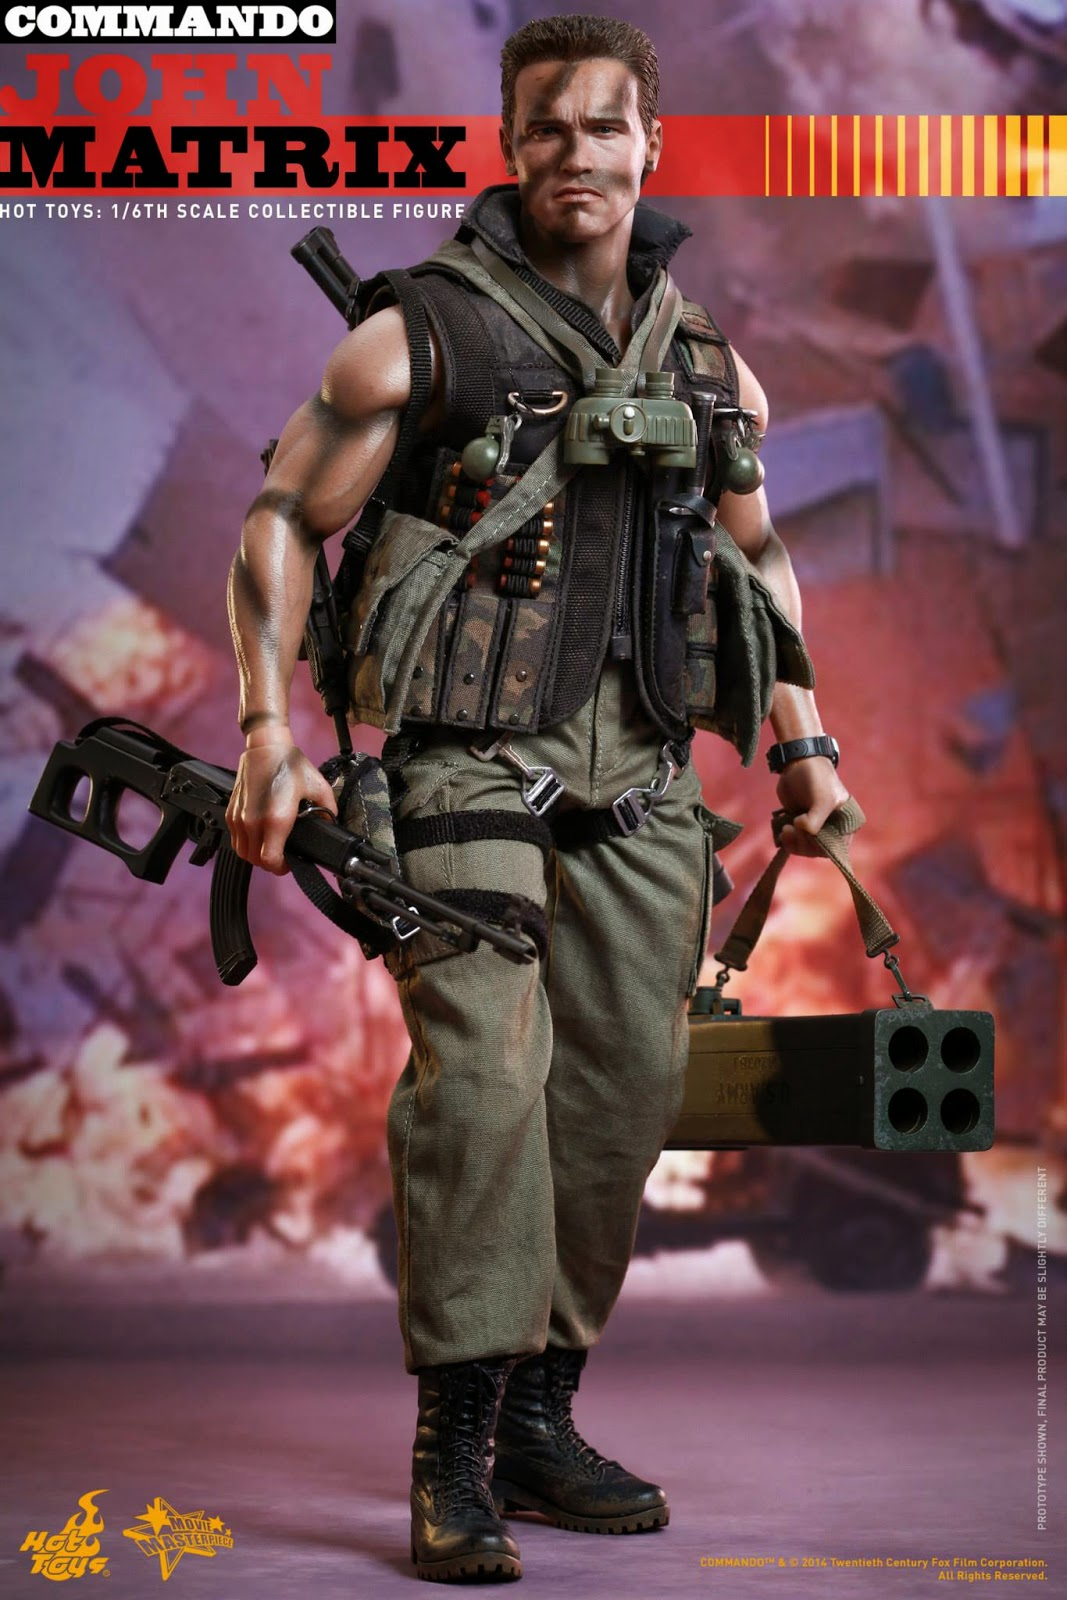 Set of 3-1//6 Scale Knives from Hot Toys MMS276 Commando John Matrix Figure